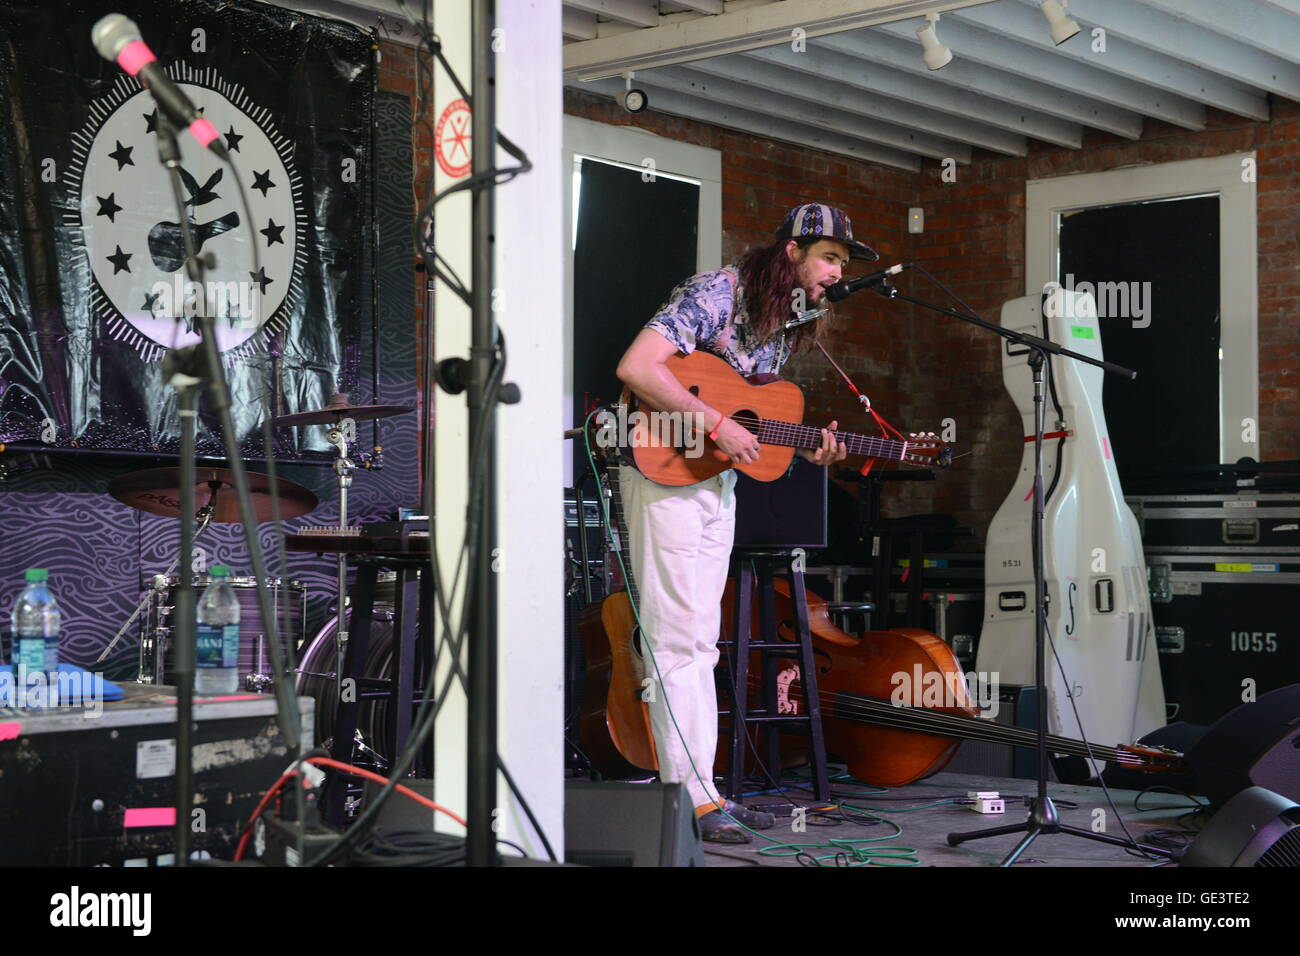 Newport, RI, USA. 23rd July, 2016. Elvis Perkins at the 2016 Newport Folk Festival. Newport, RI. 7/23/16. Sun Sentinel - Stock Image